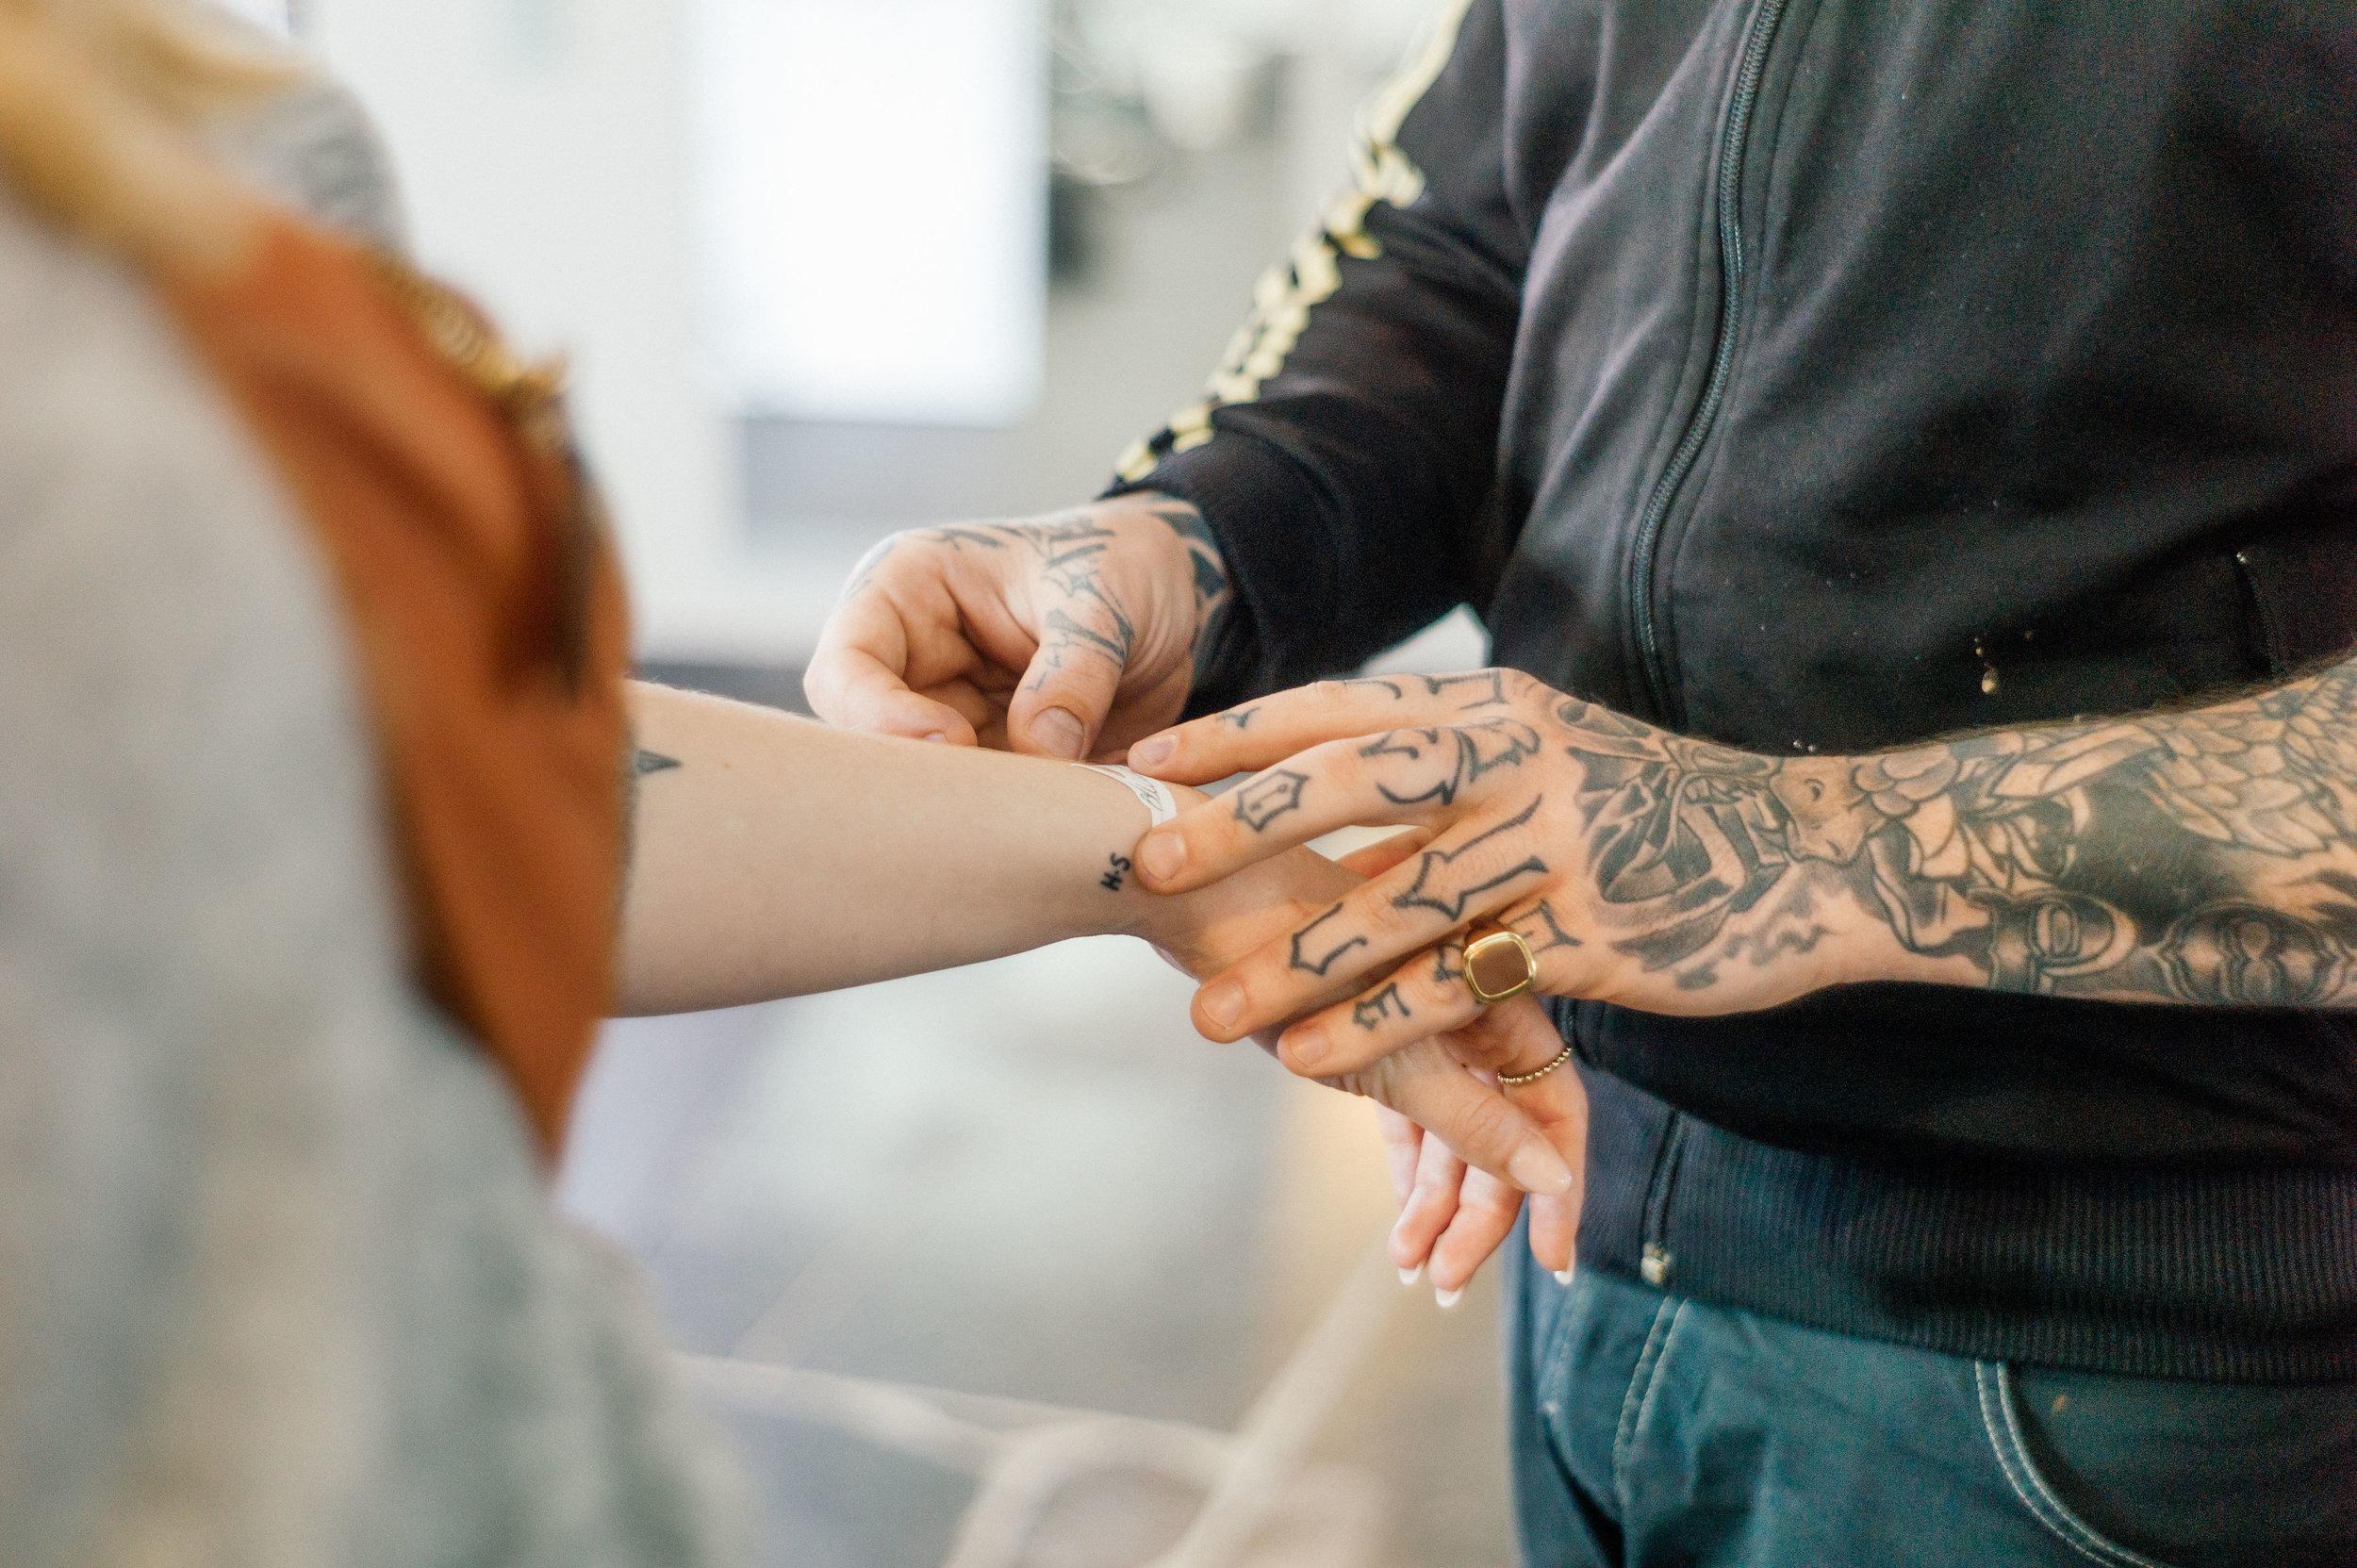 Tattoo Removal - 2 Different Methods of Non Invasive Pigment Lightening